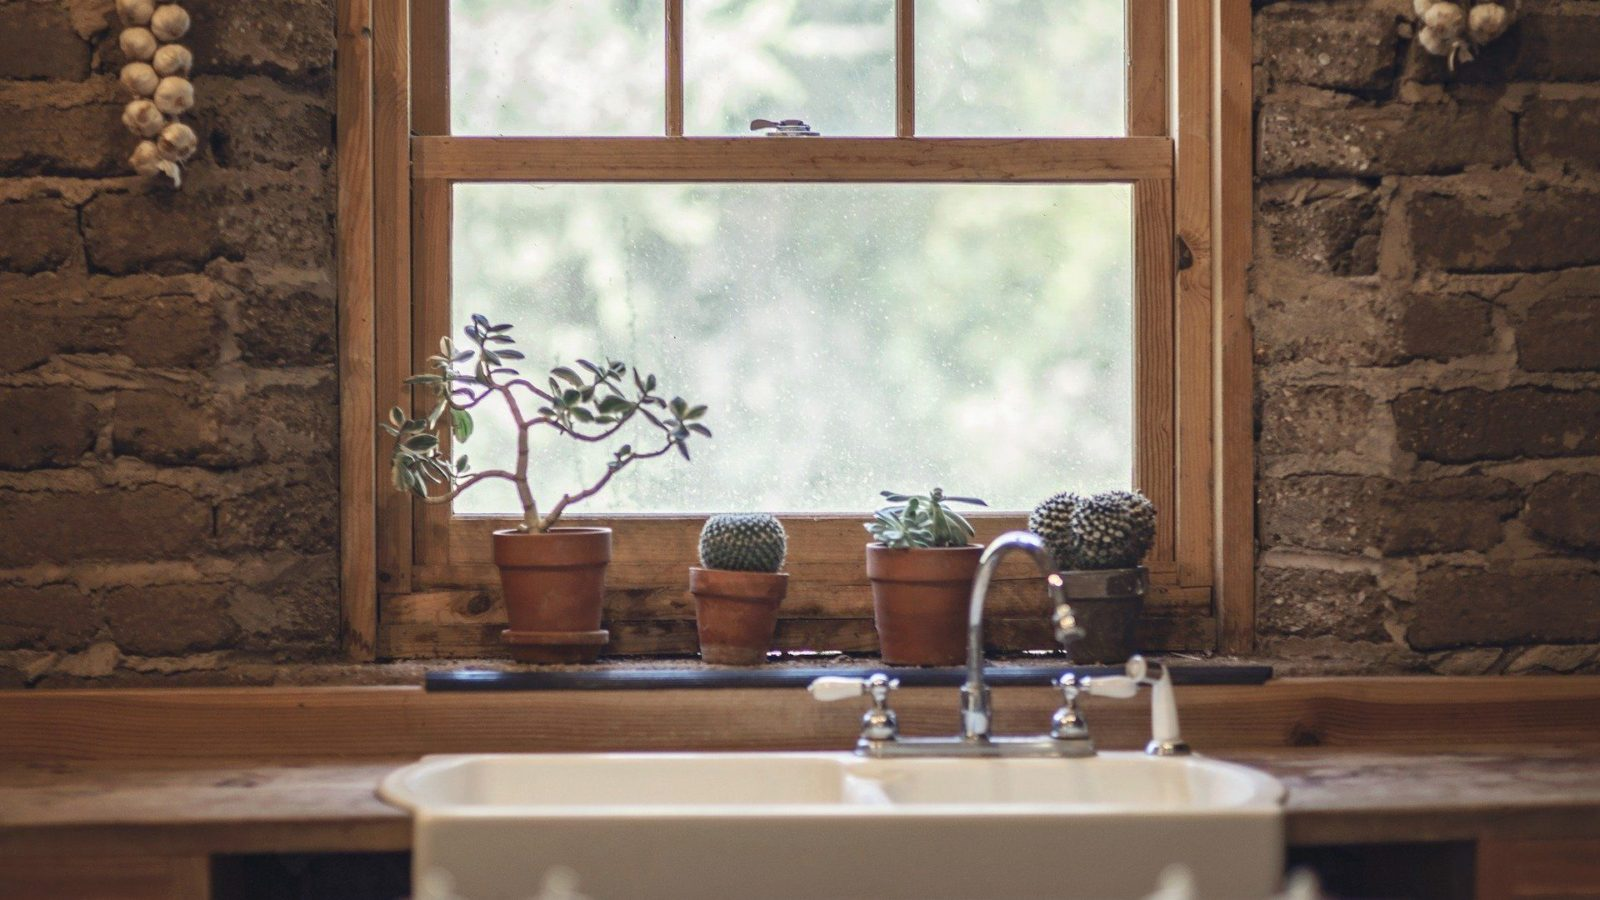 Farmhouse window with plants on sill